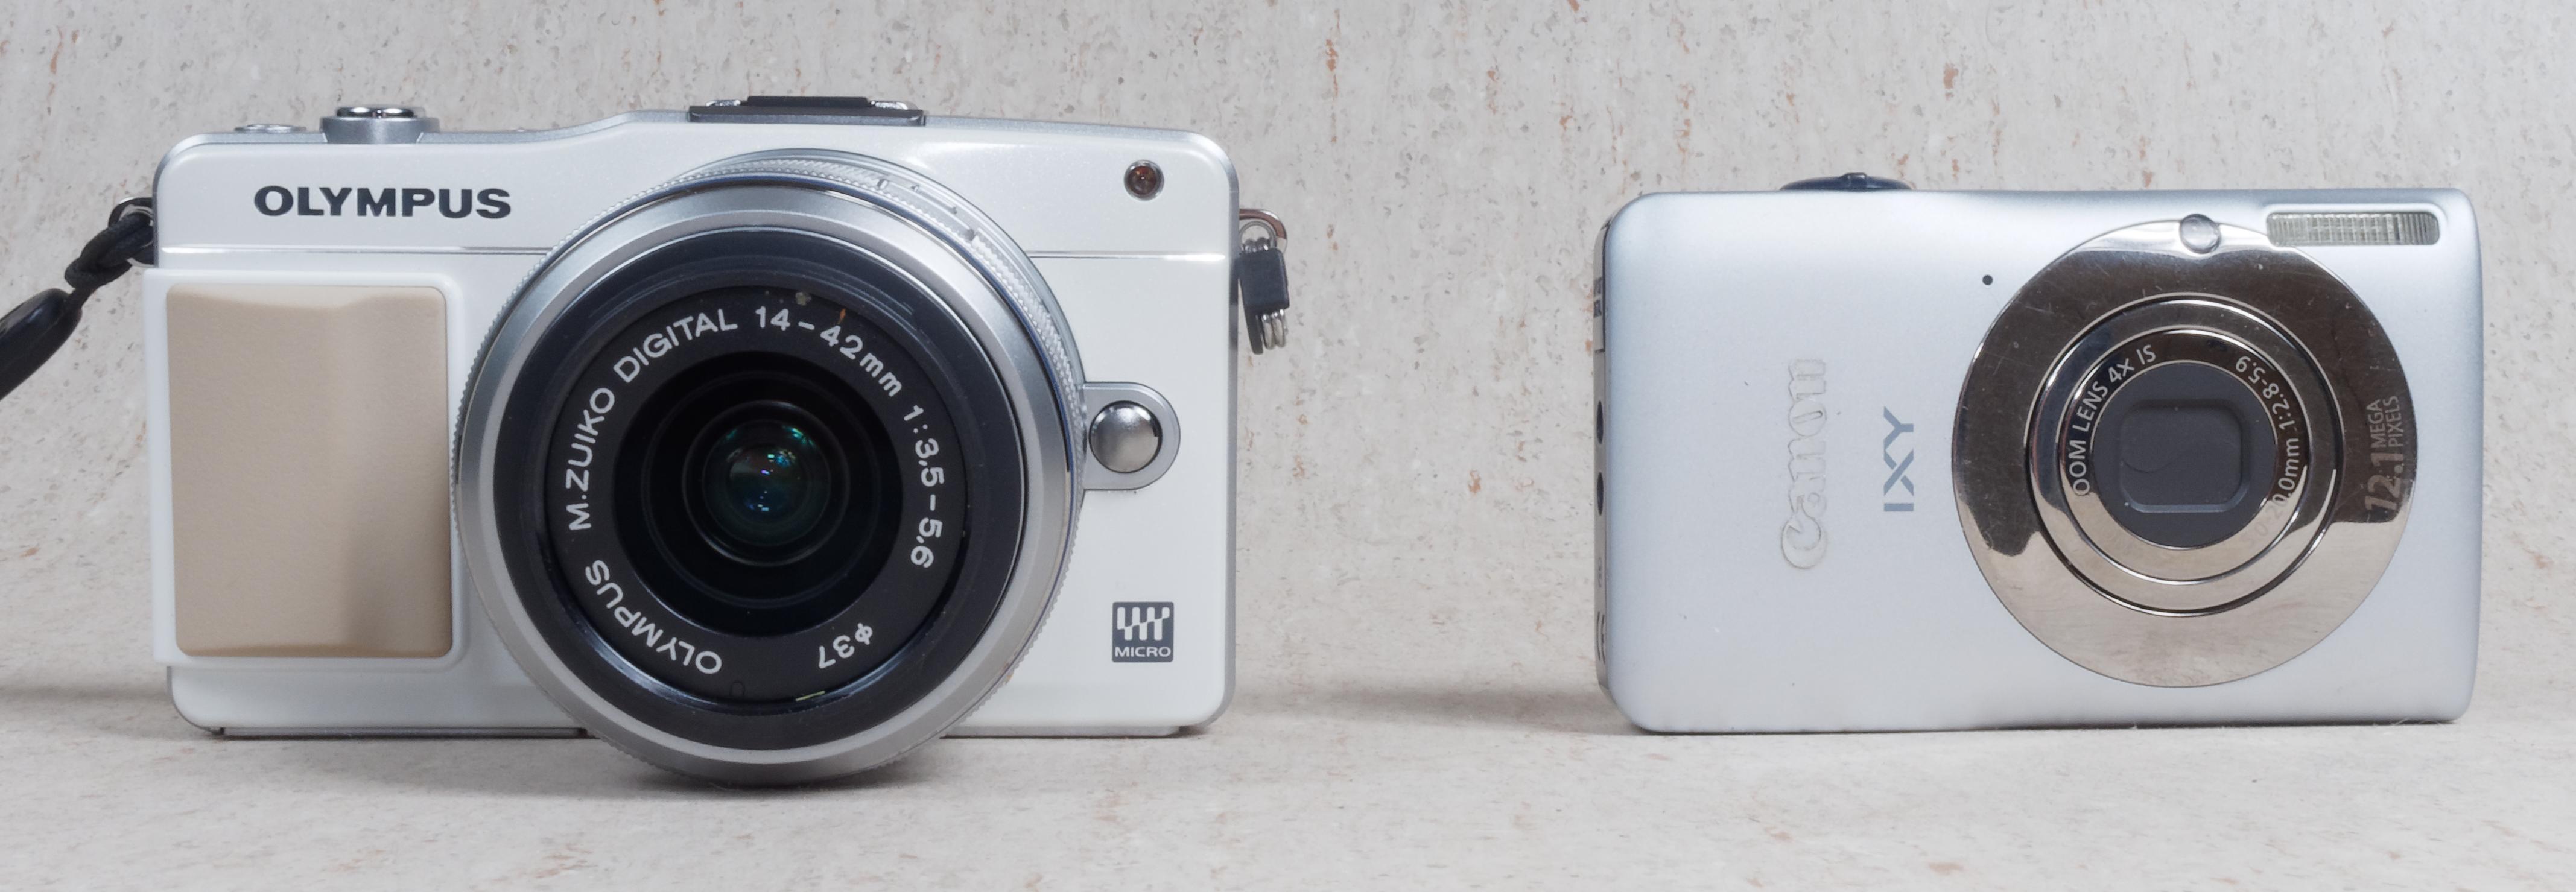 Oly-Canon-2.jpeg